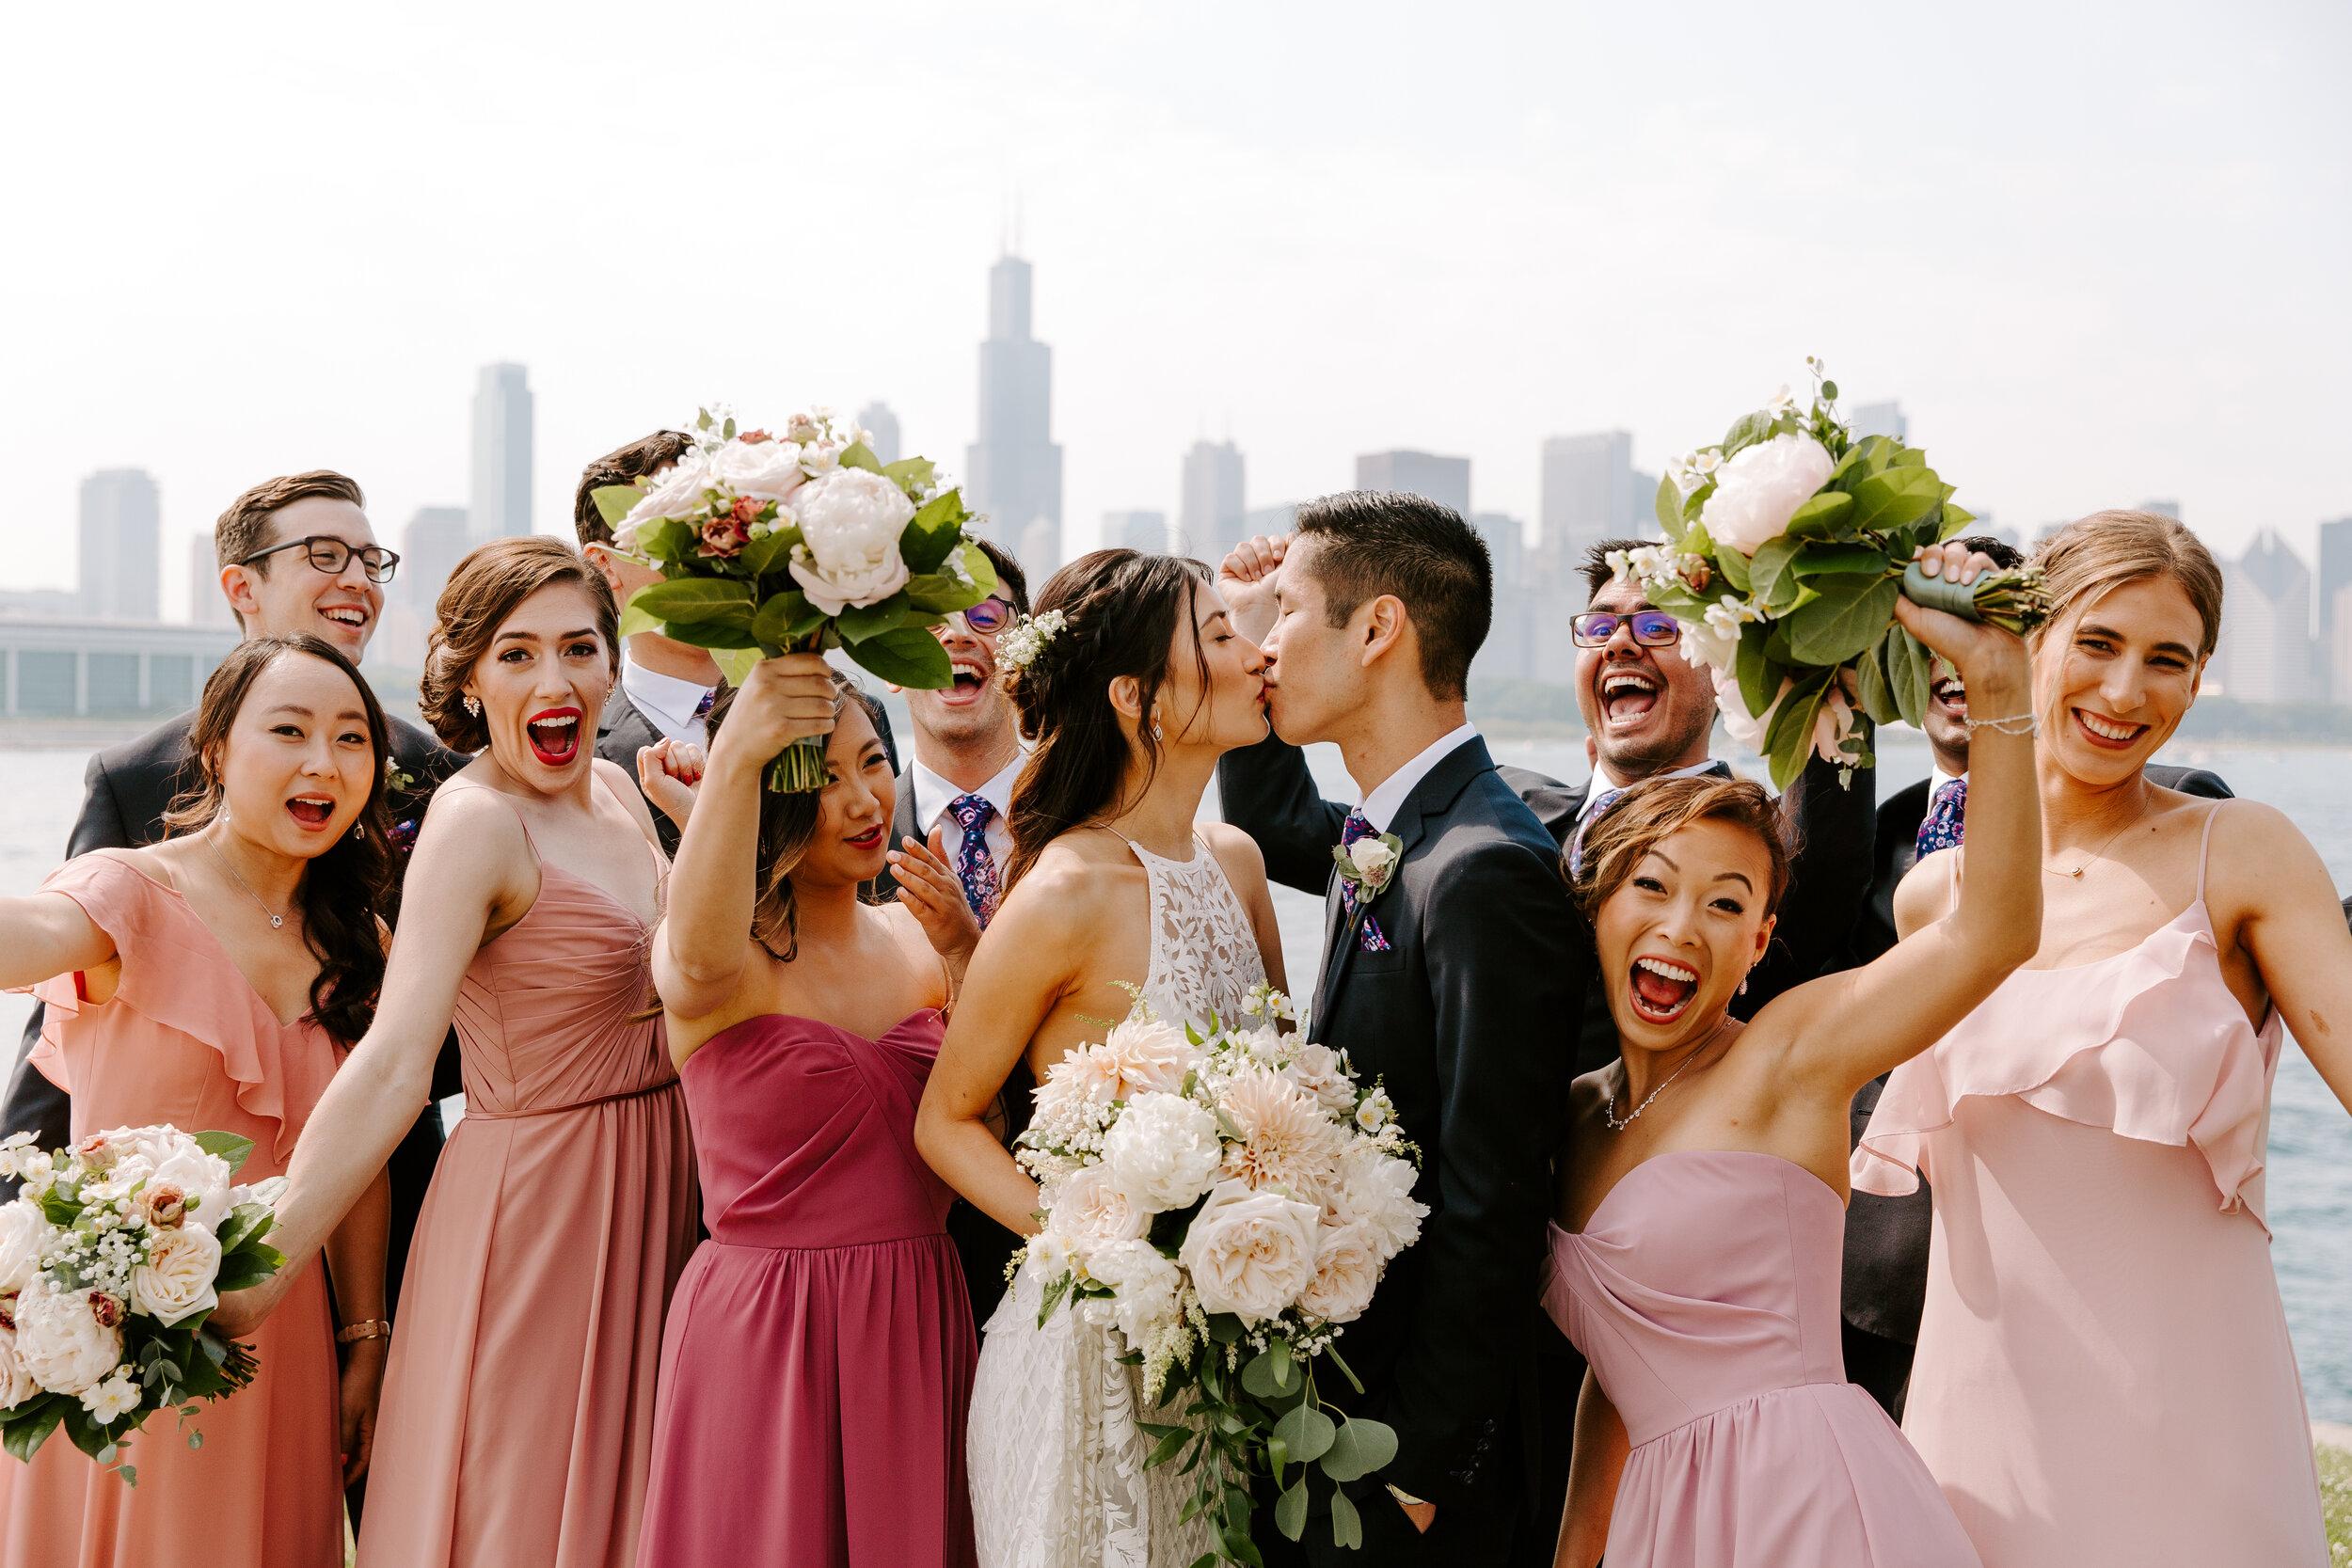 quan wedding-137.jpg